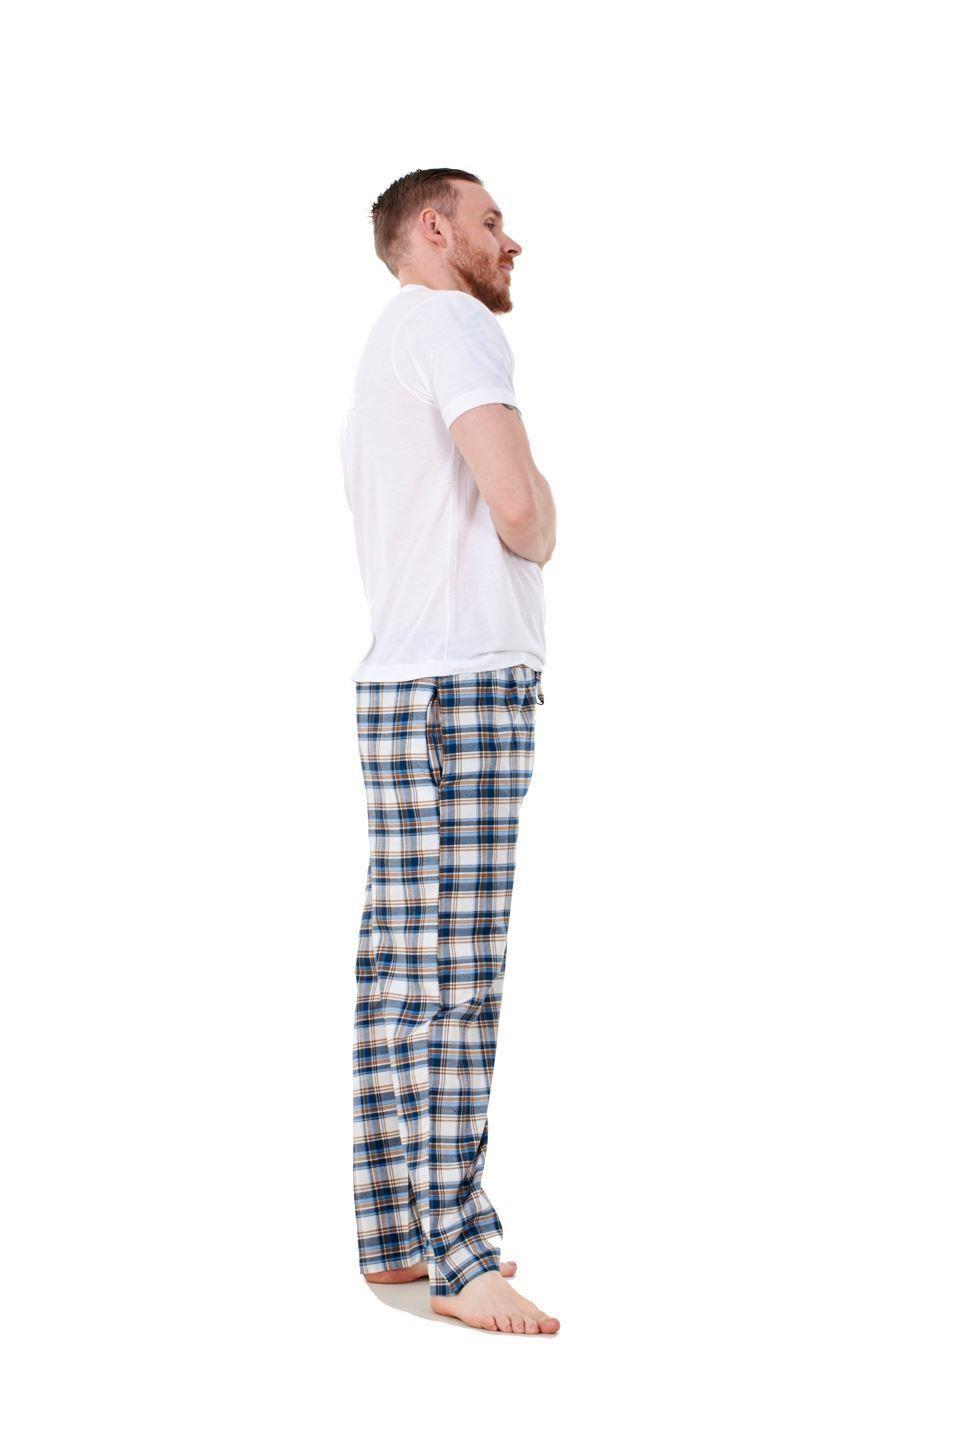 Mens-Pyjama-Bottoms-Rich-Cotton-Woven-Check-Lounge-Pant-Nightwear-Big-3XL-to-5XL Indexbild 25